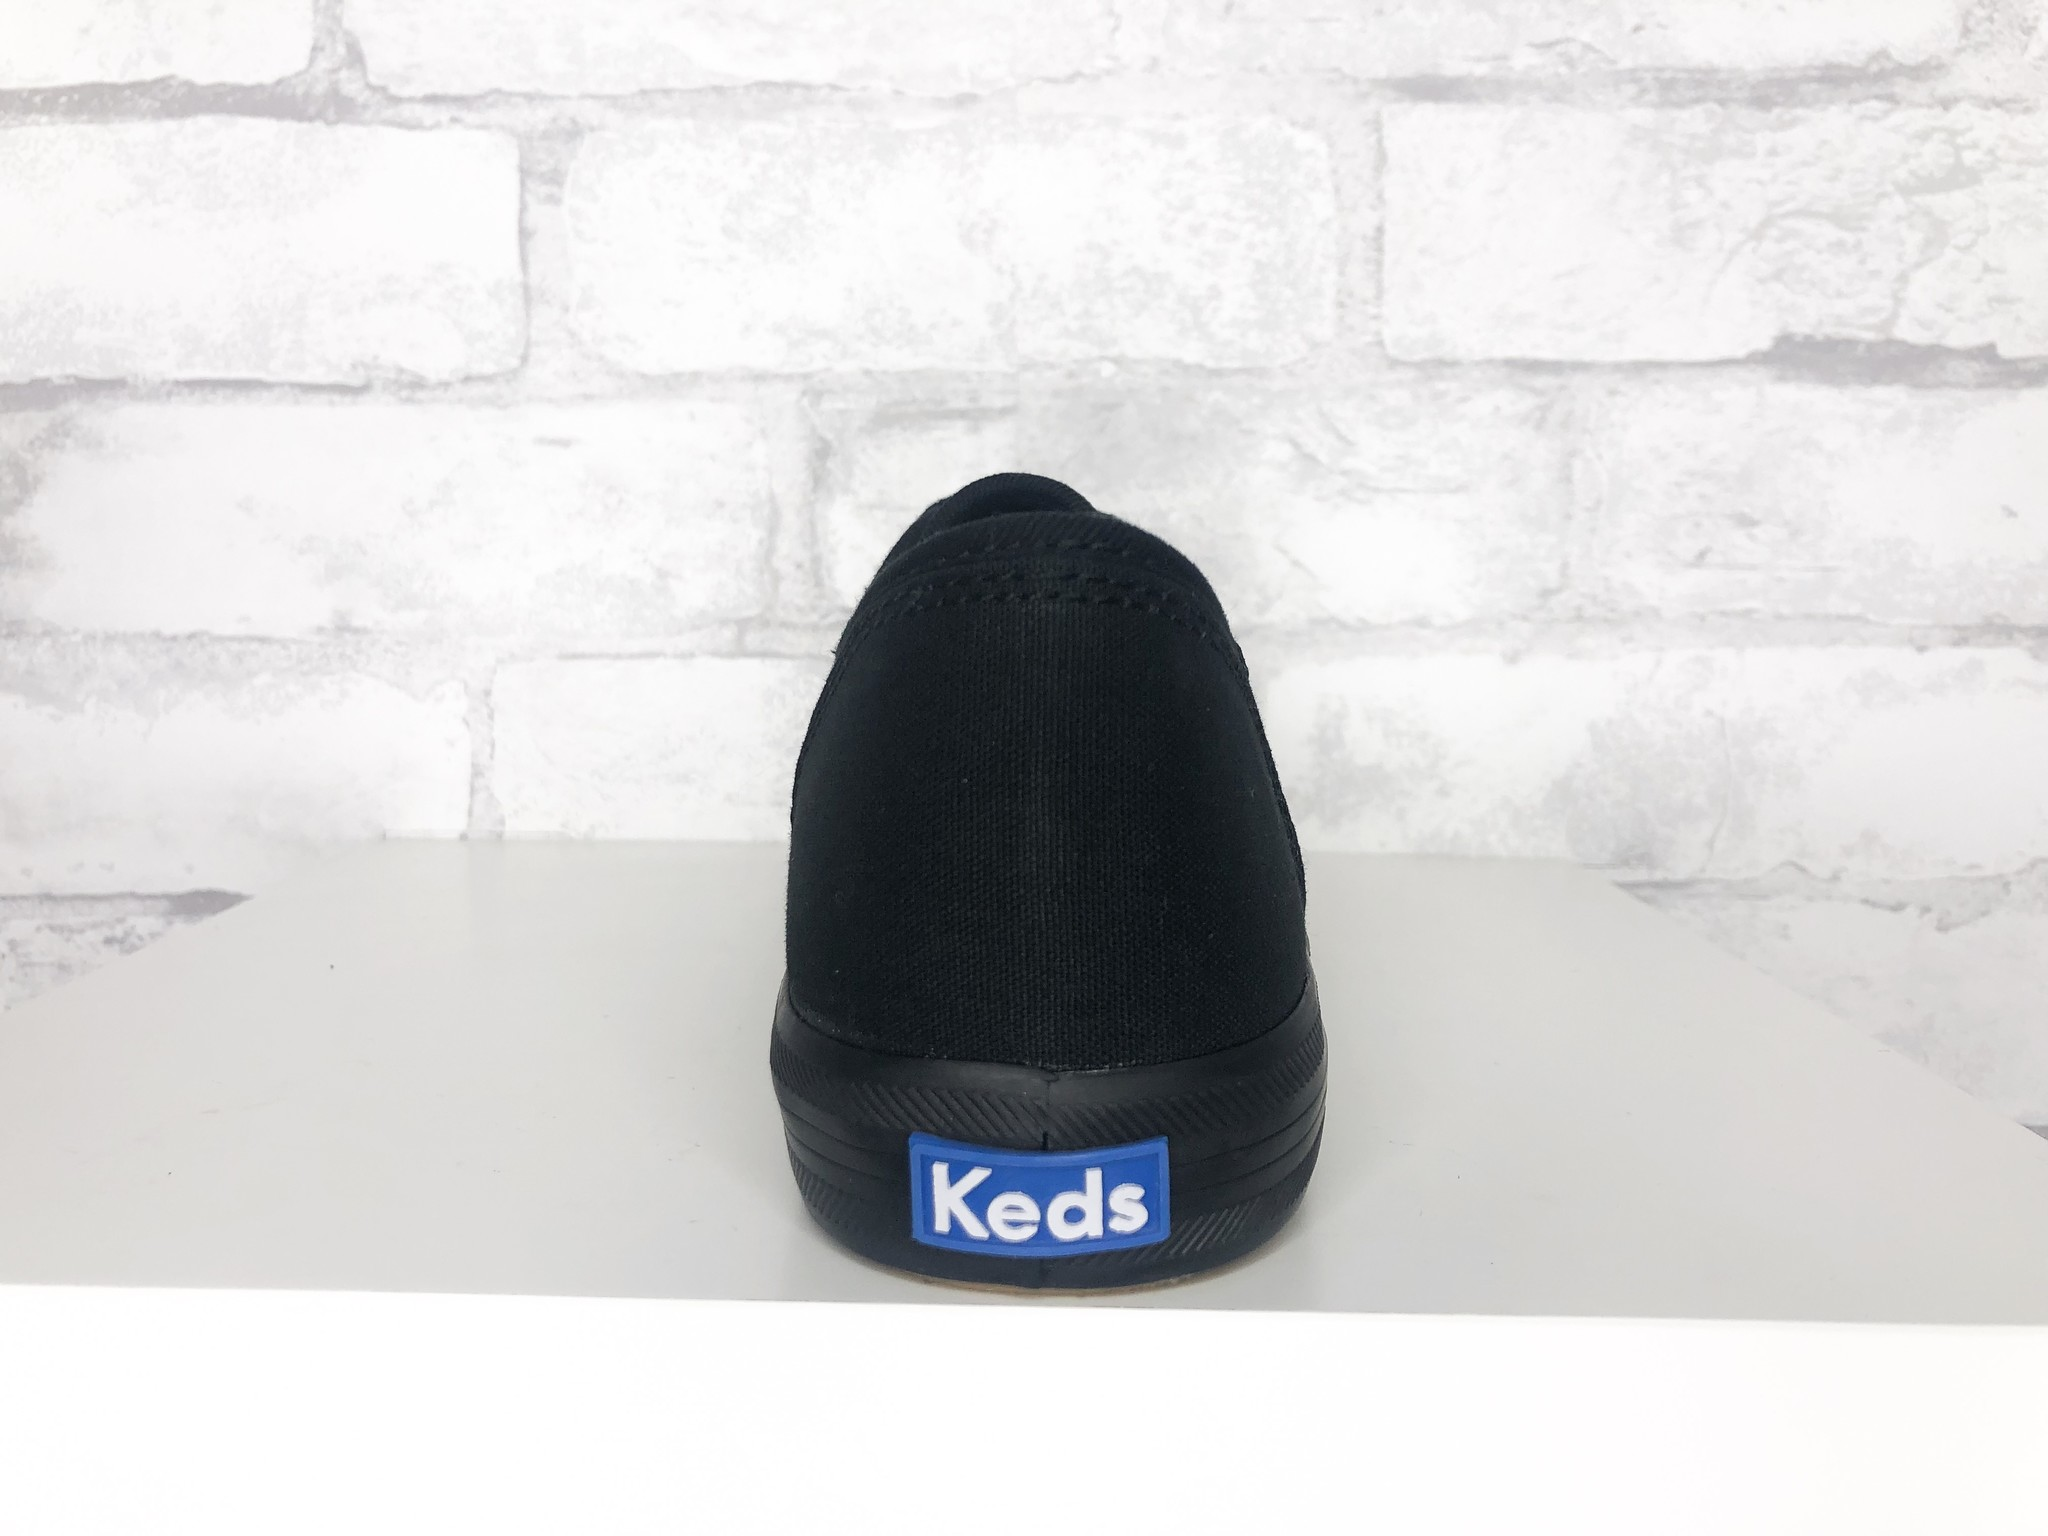 Keds Kickstart Black